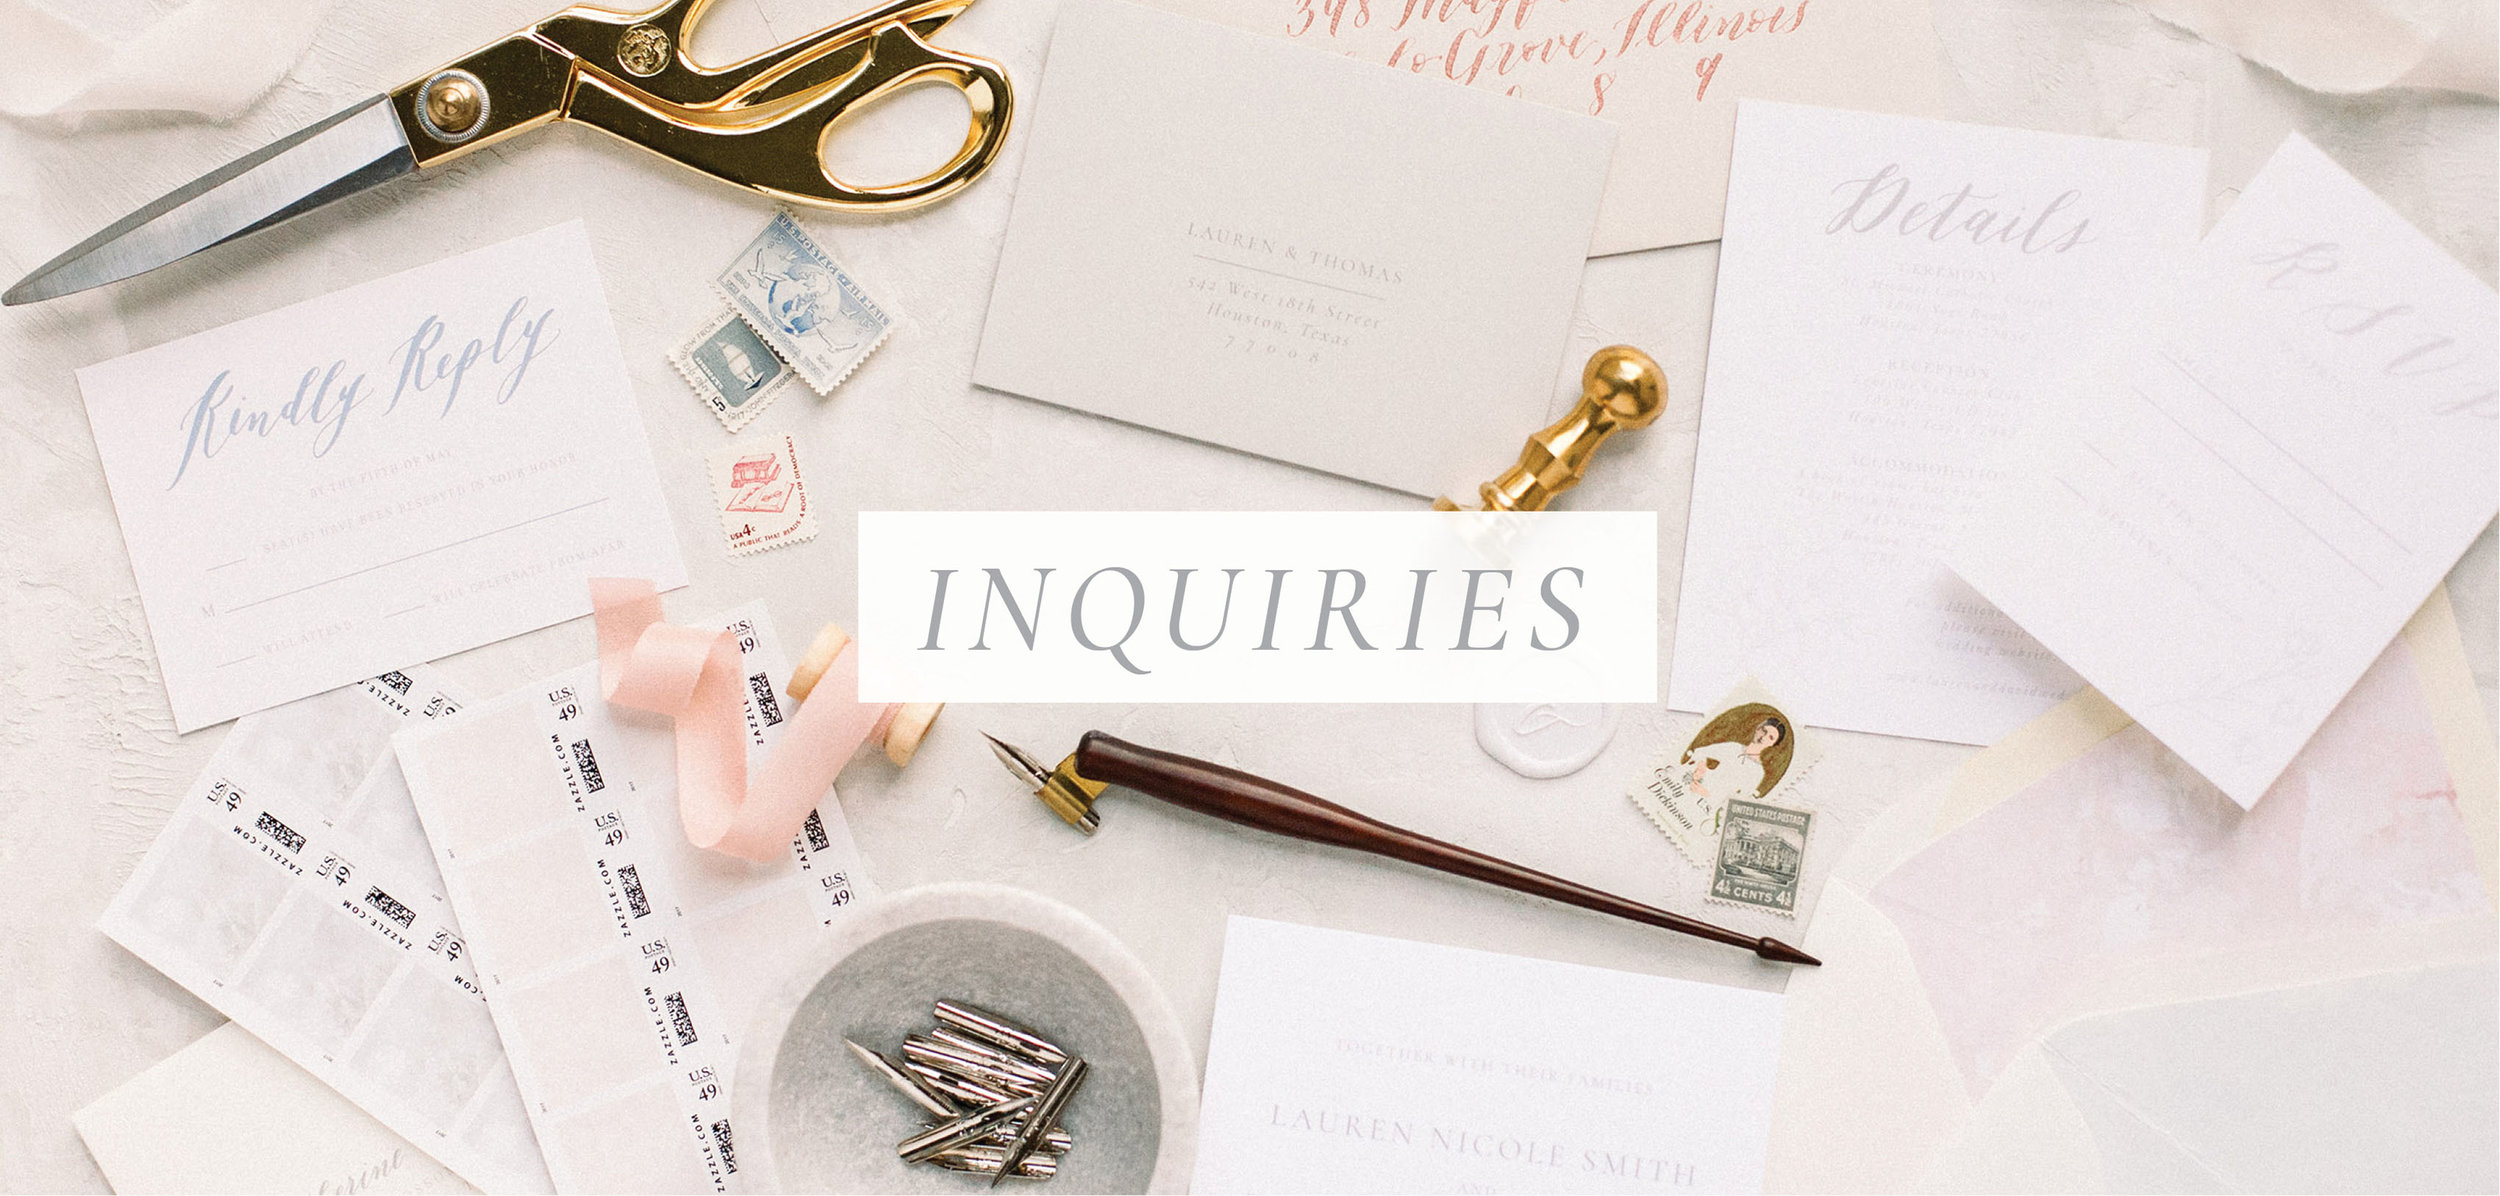 Dreams and Nostalgia Wedding Invitation Designer_Inquire.jpg